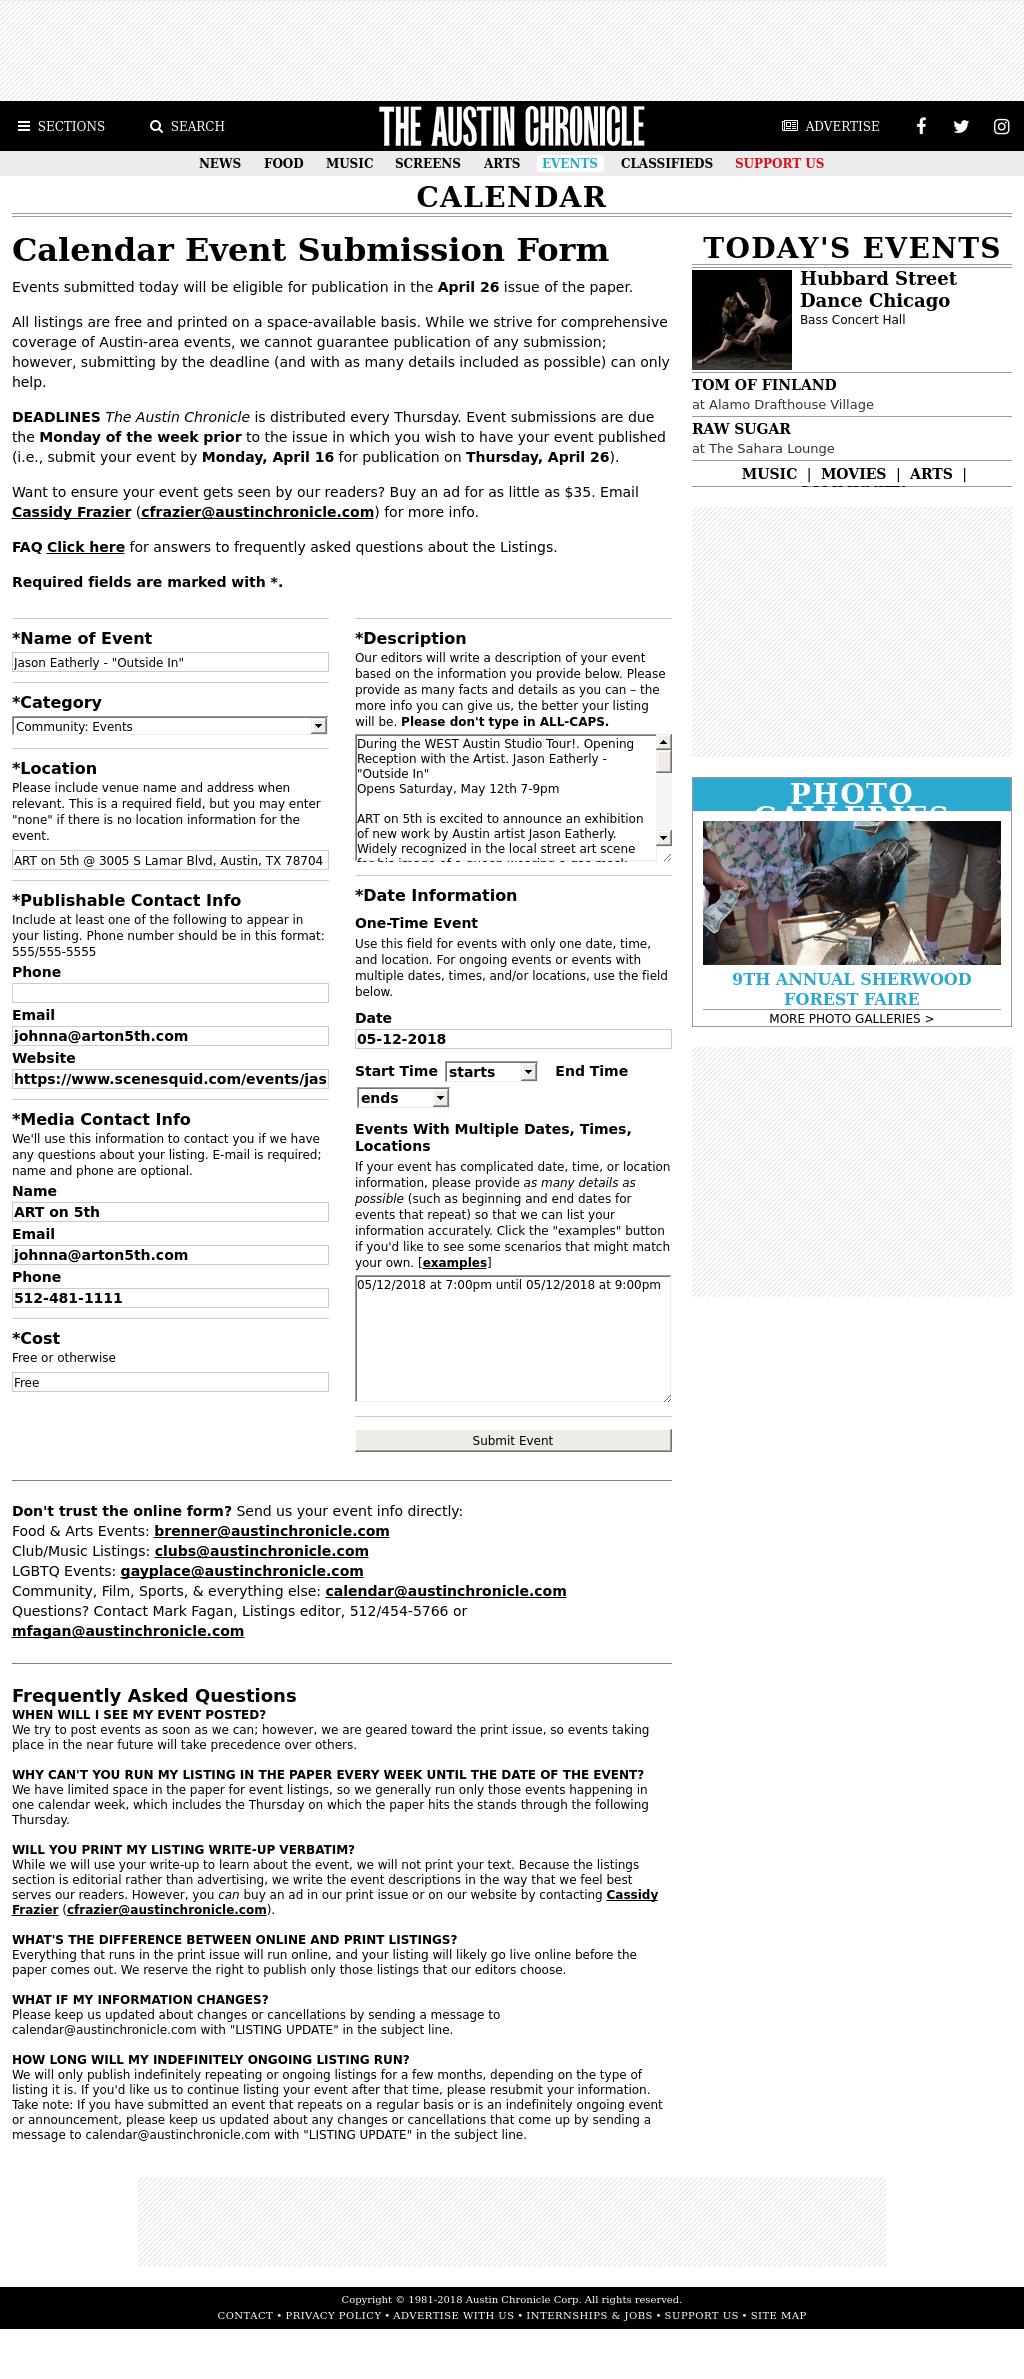 Screenshot from Austin Chronicle integration